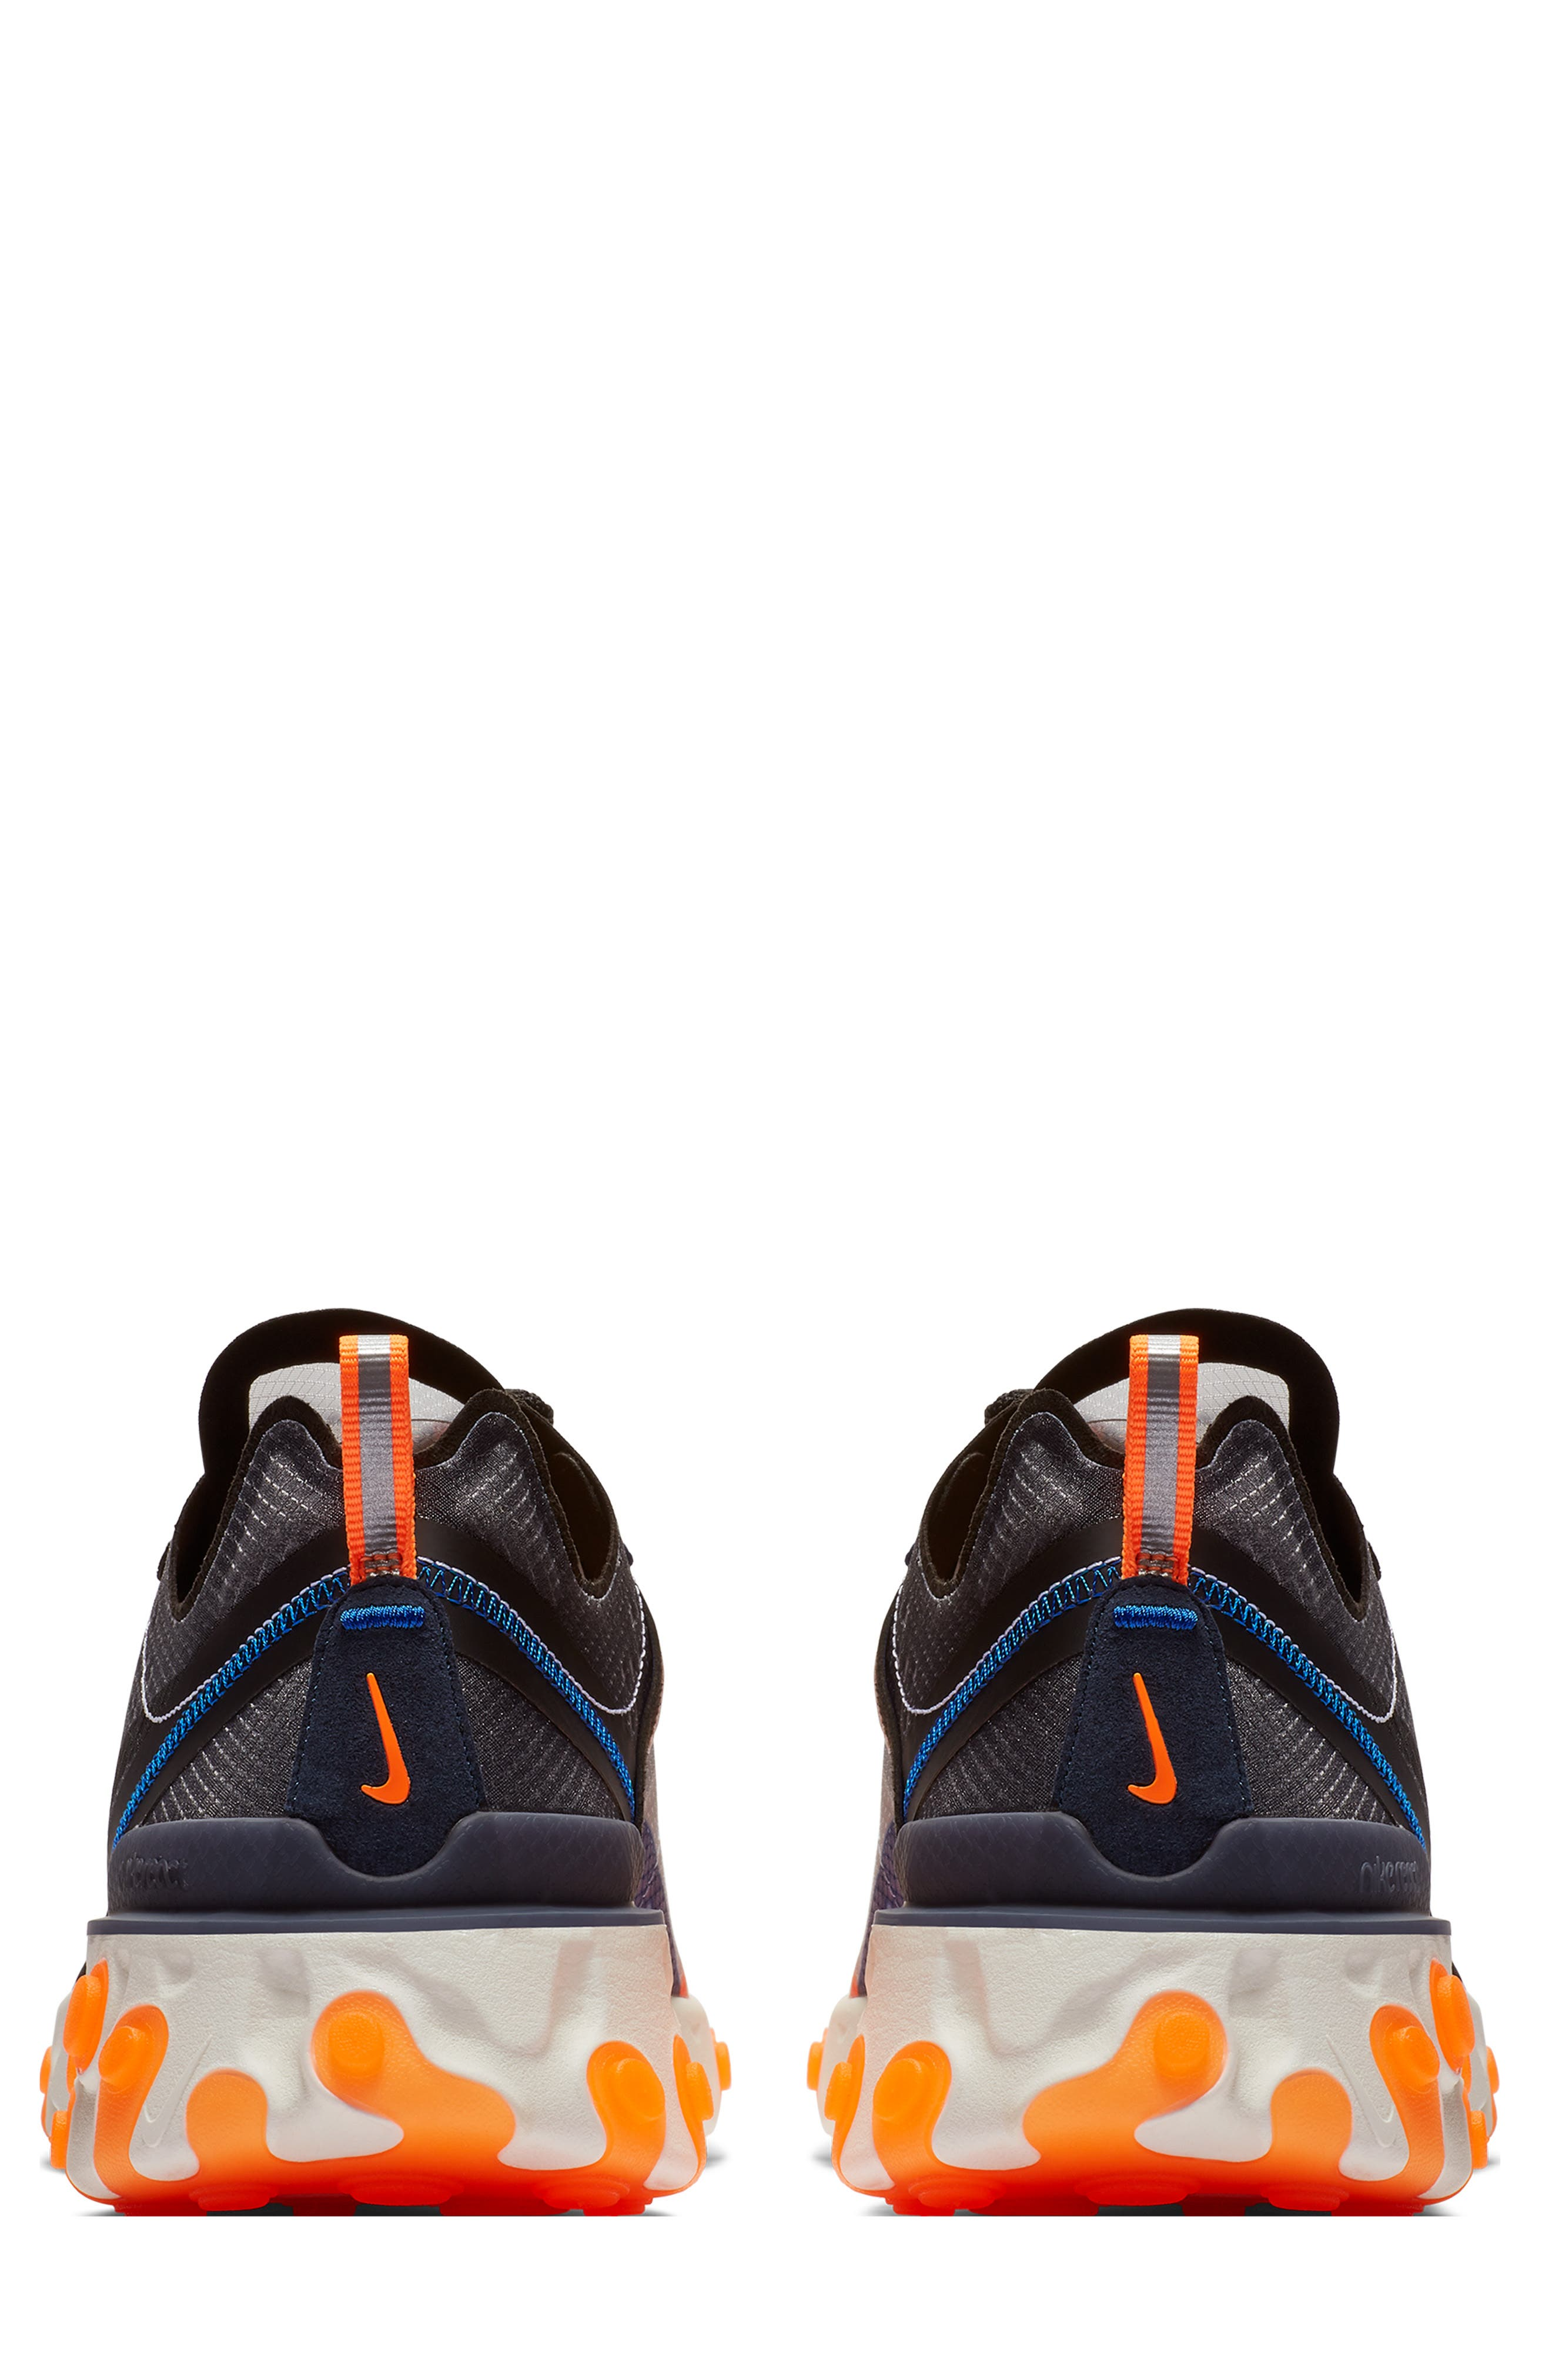 React Element 87 Sneaker,                             Alternate thumbnail 2, color,                             021